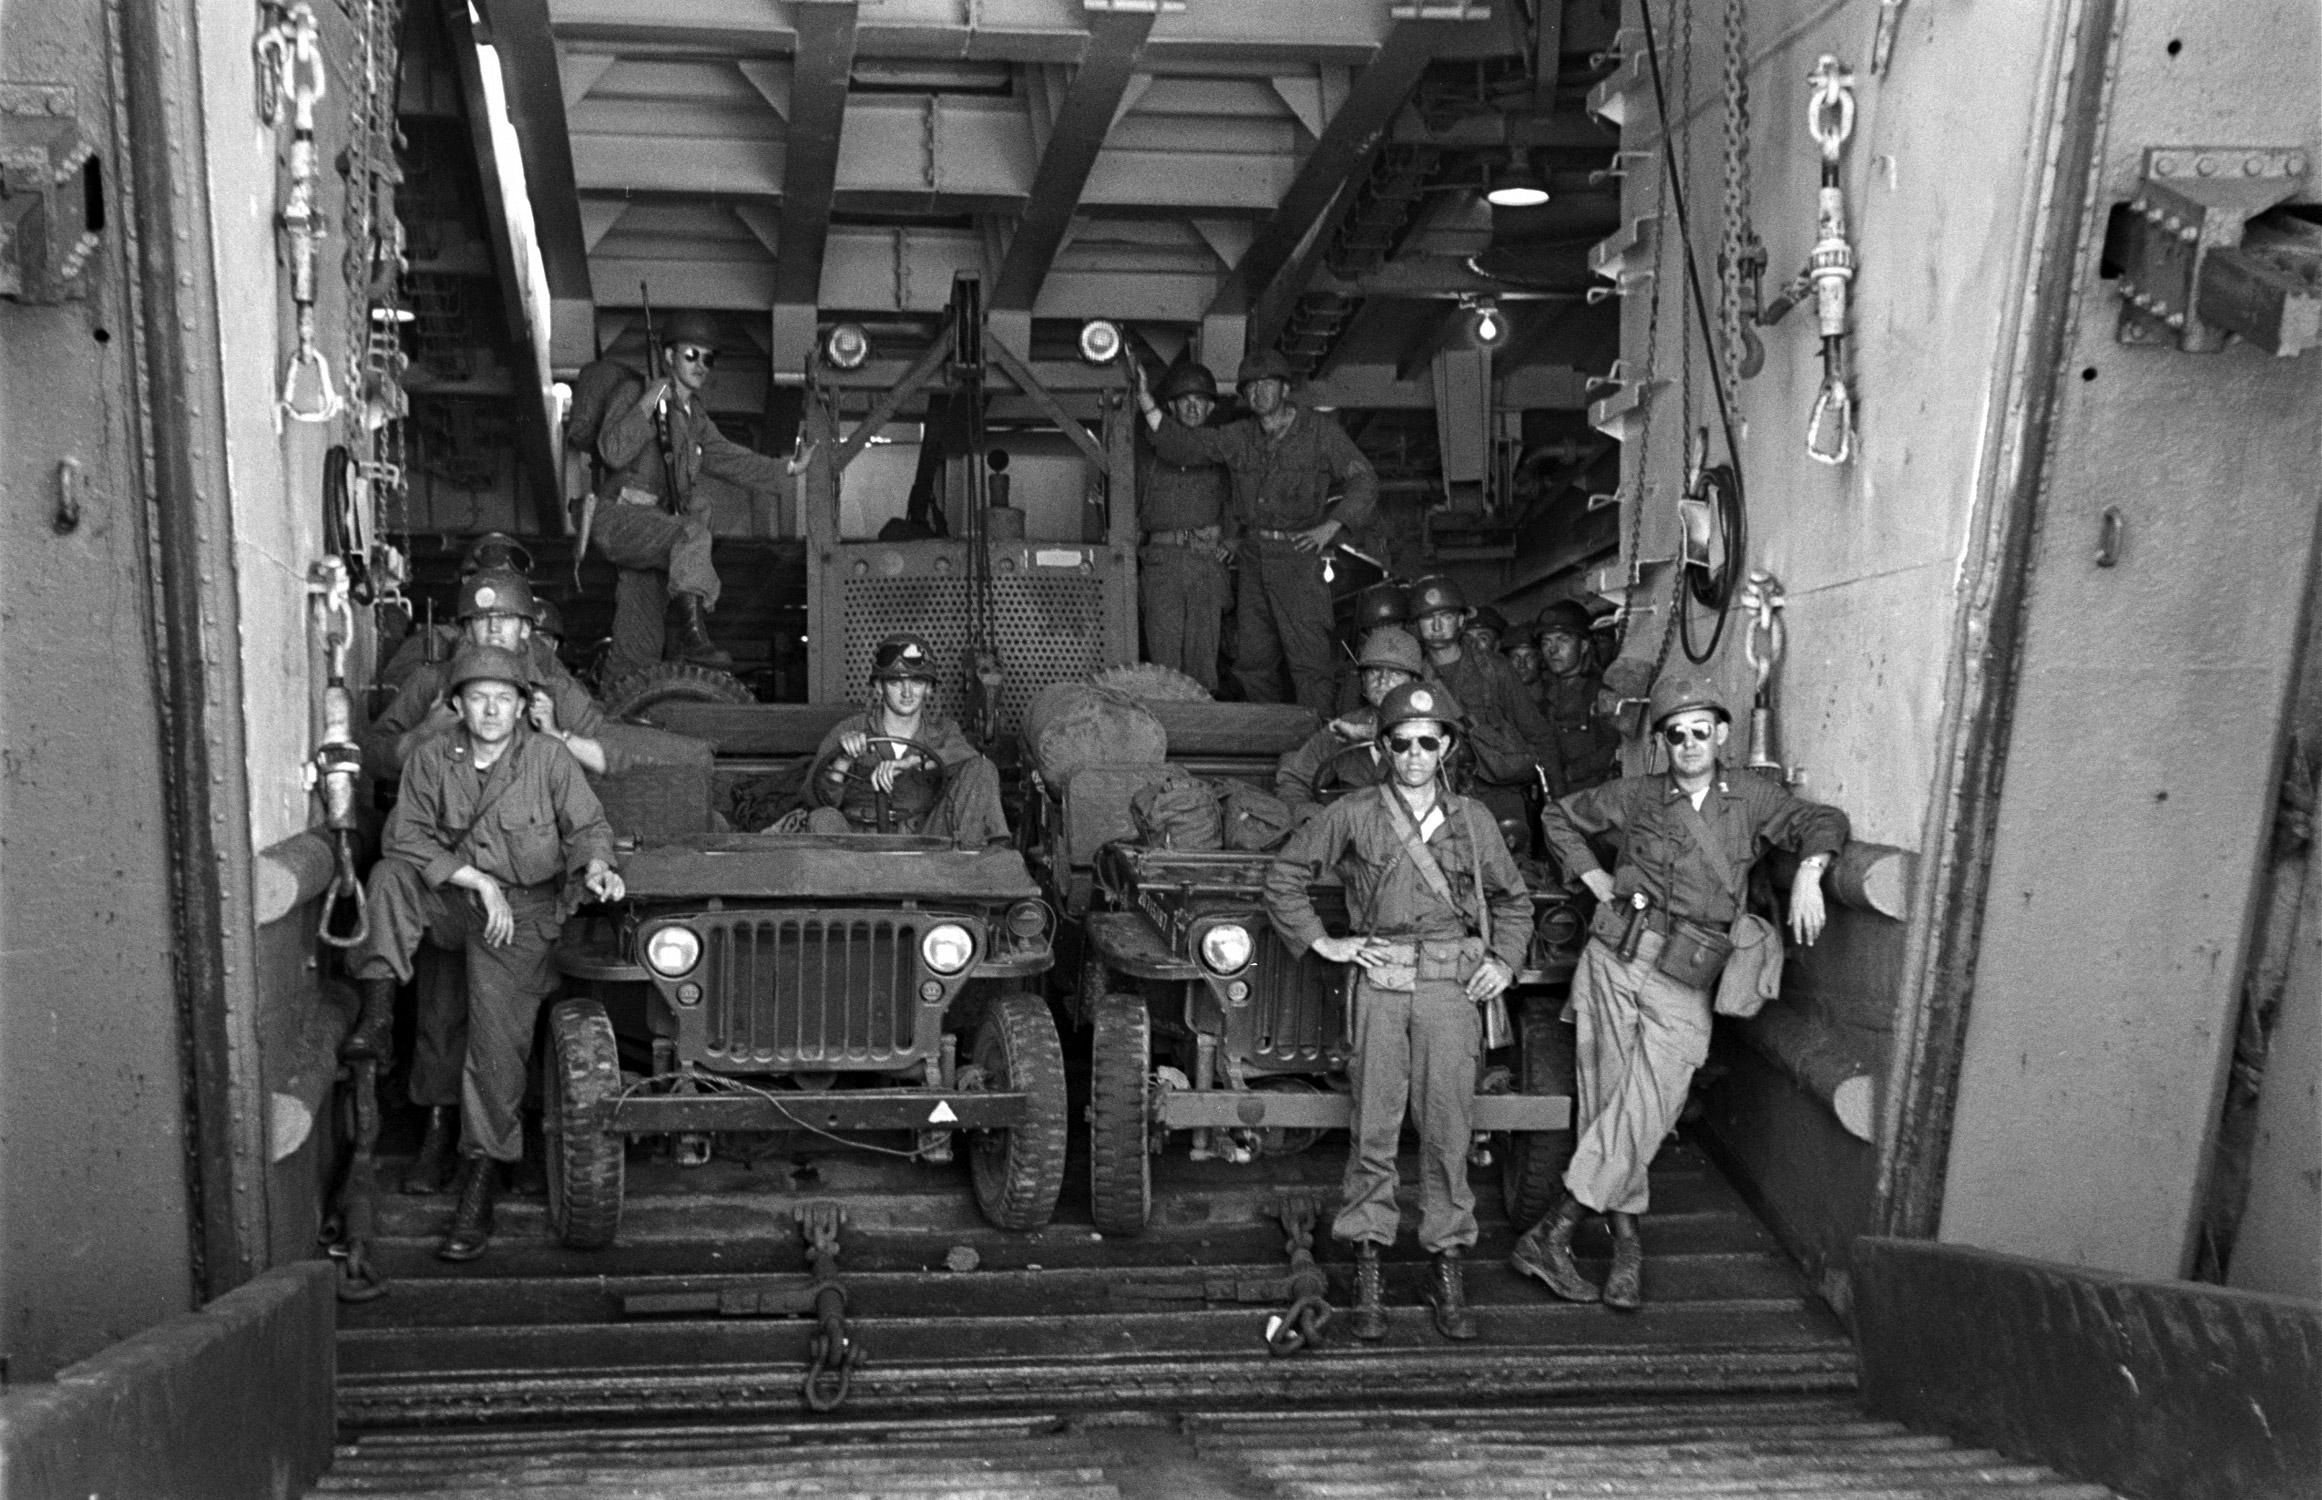 The 1st Cavalry in Korea, July 1950.